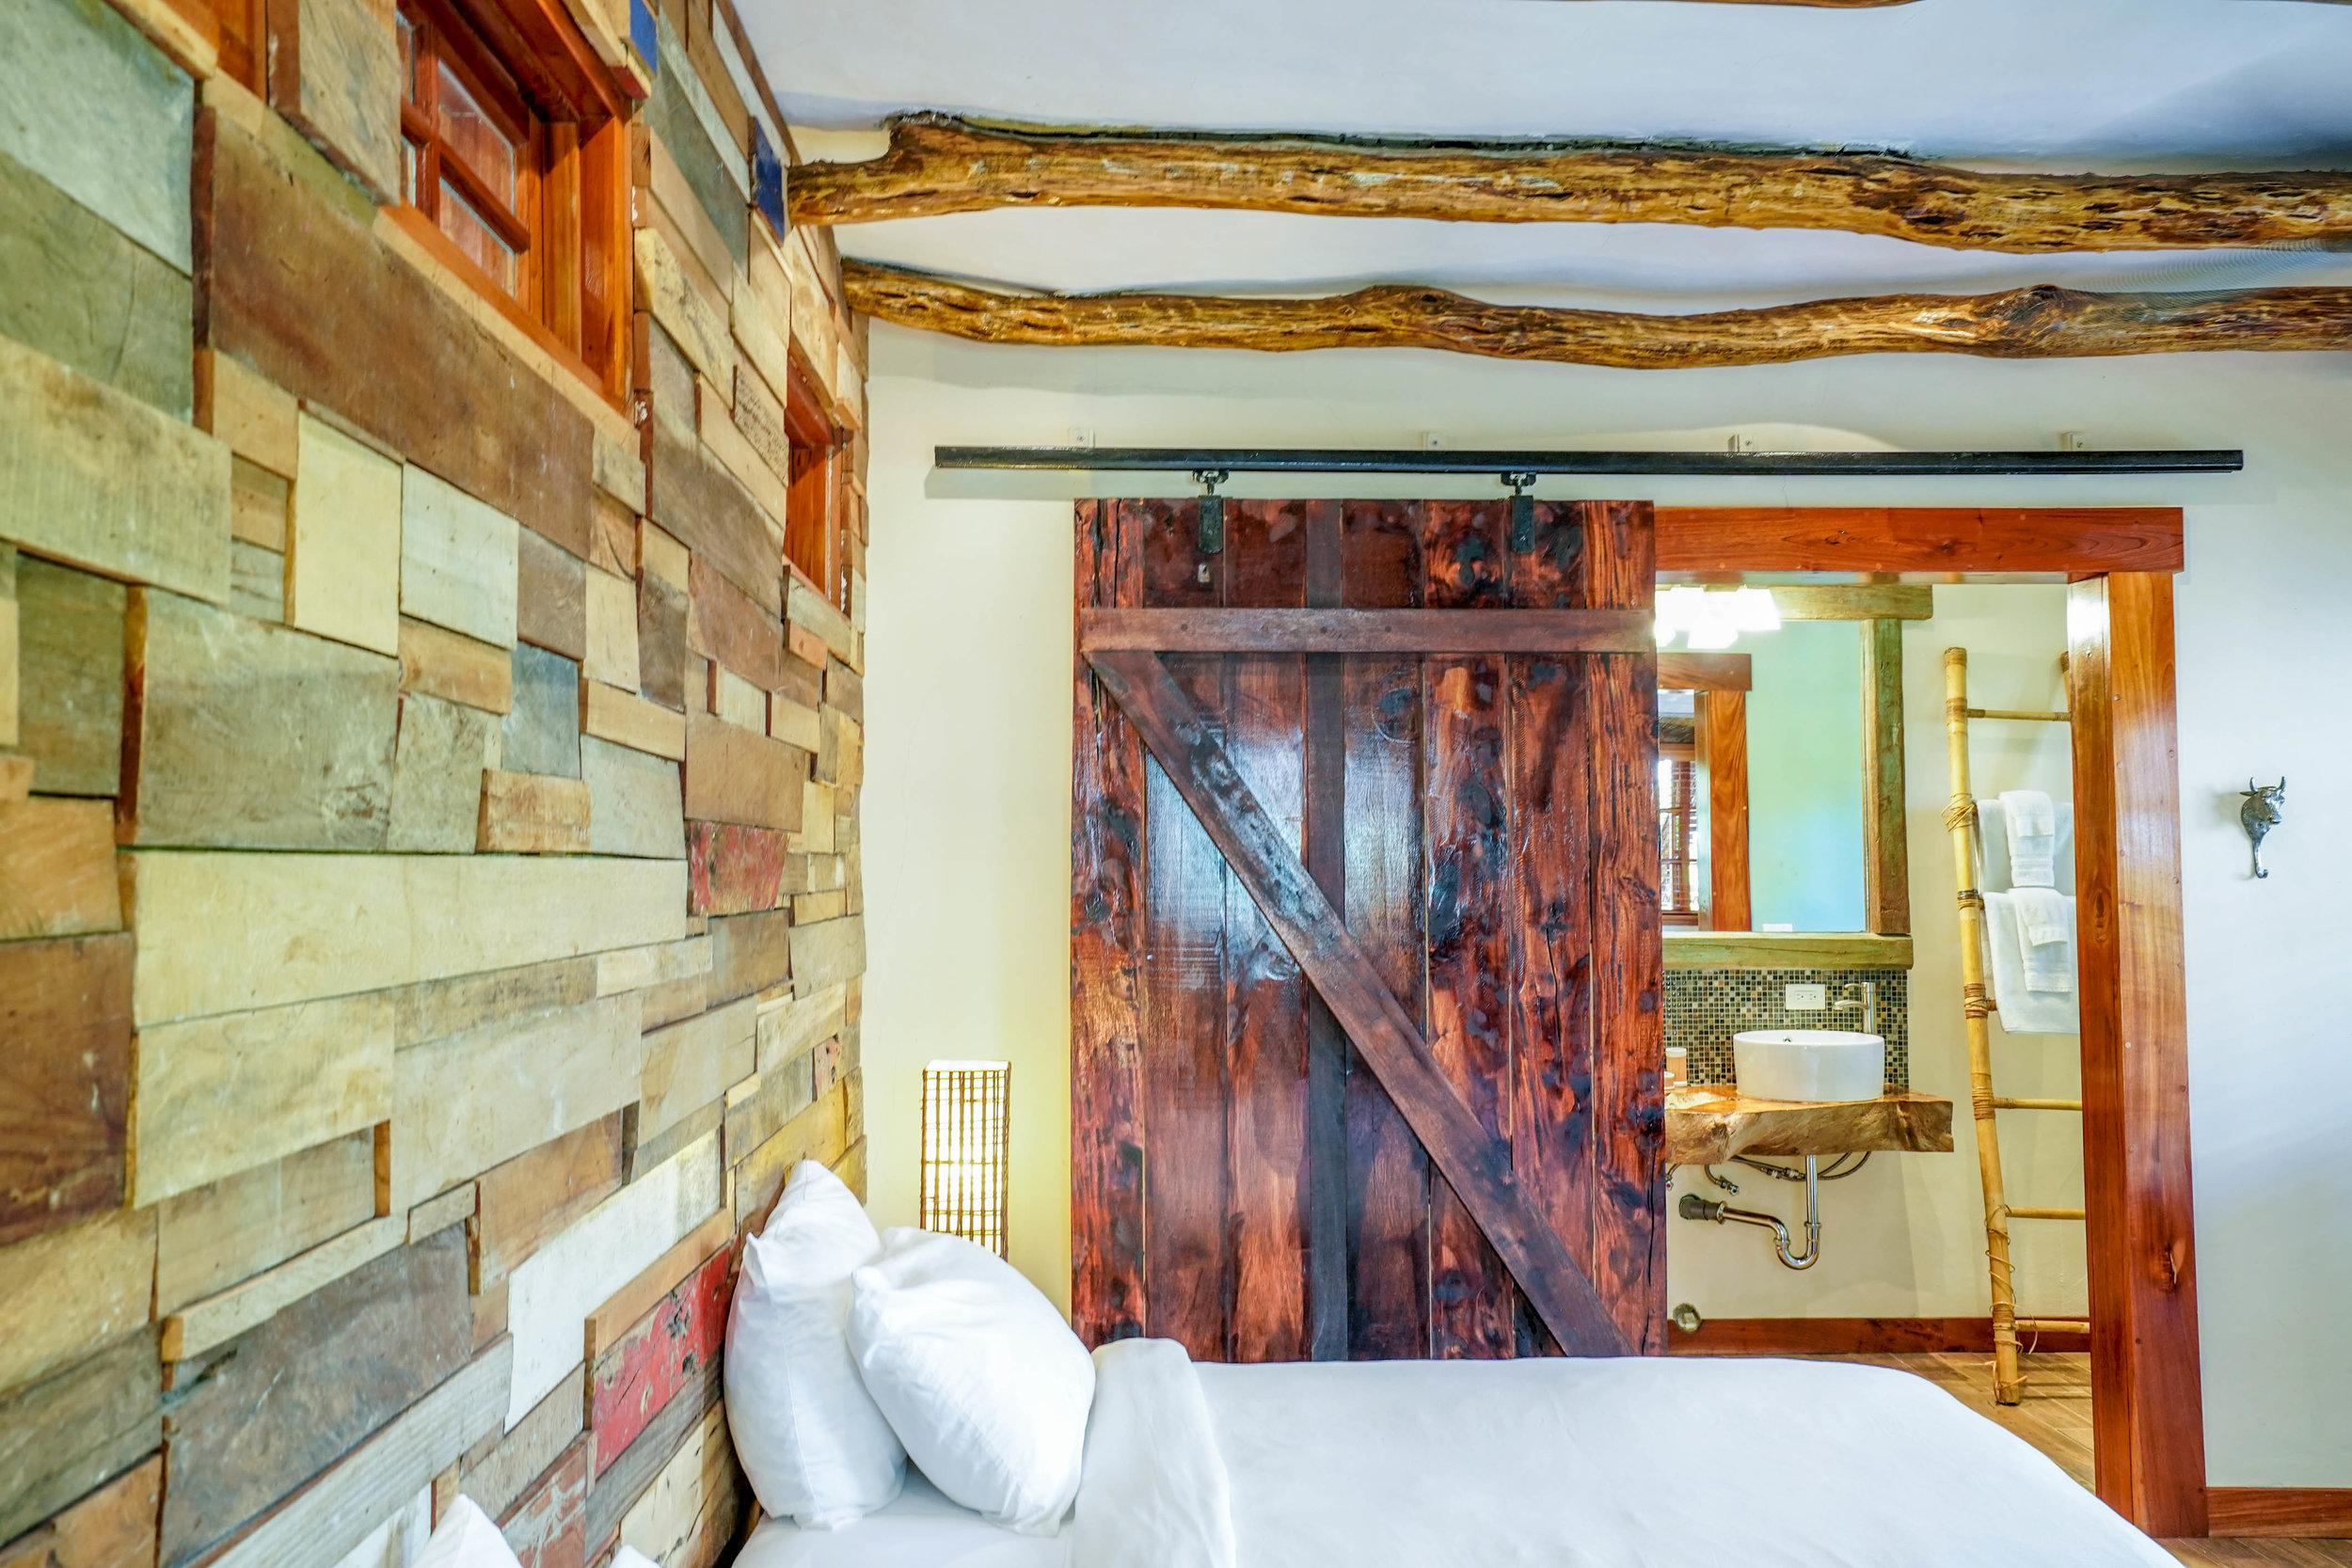 Sansara_Resort_Cabana_CasaAntigua_lowres-2.jpg